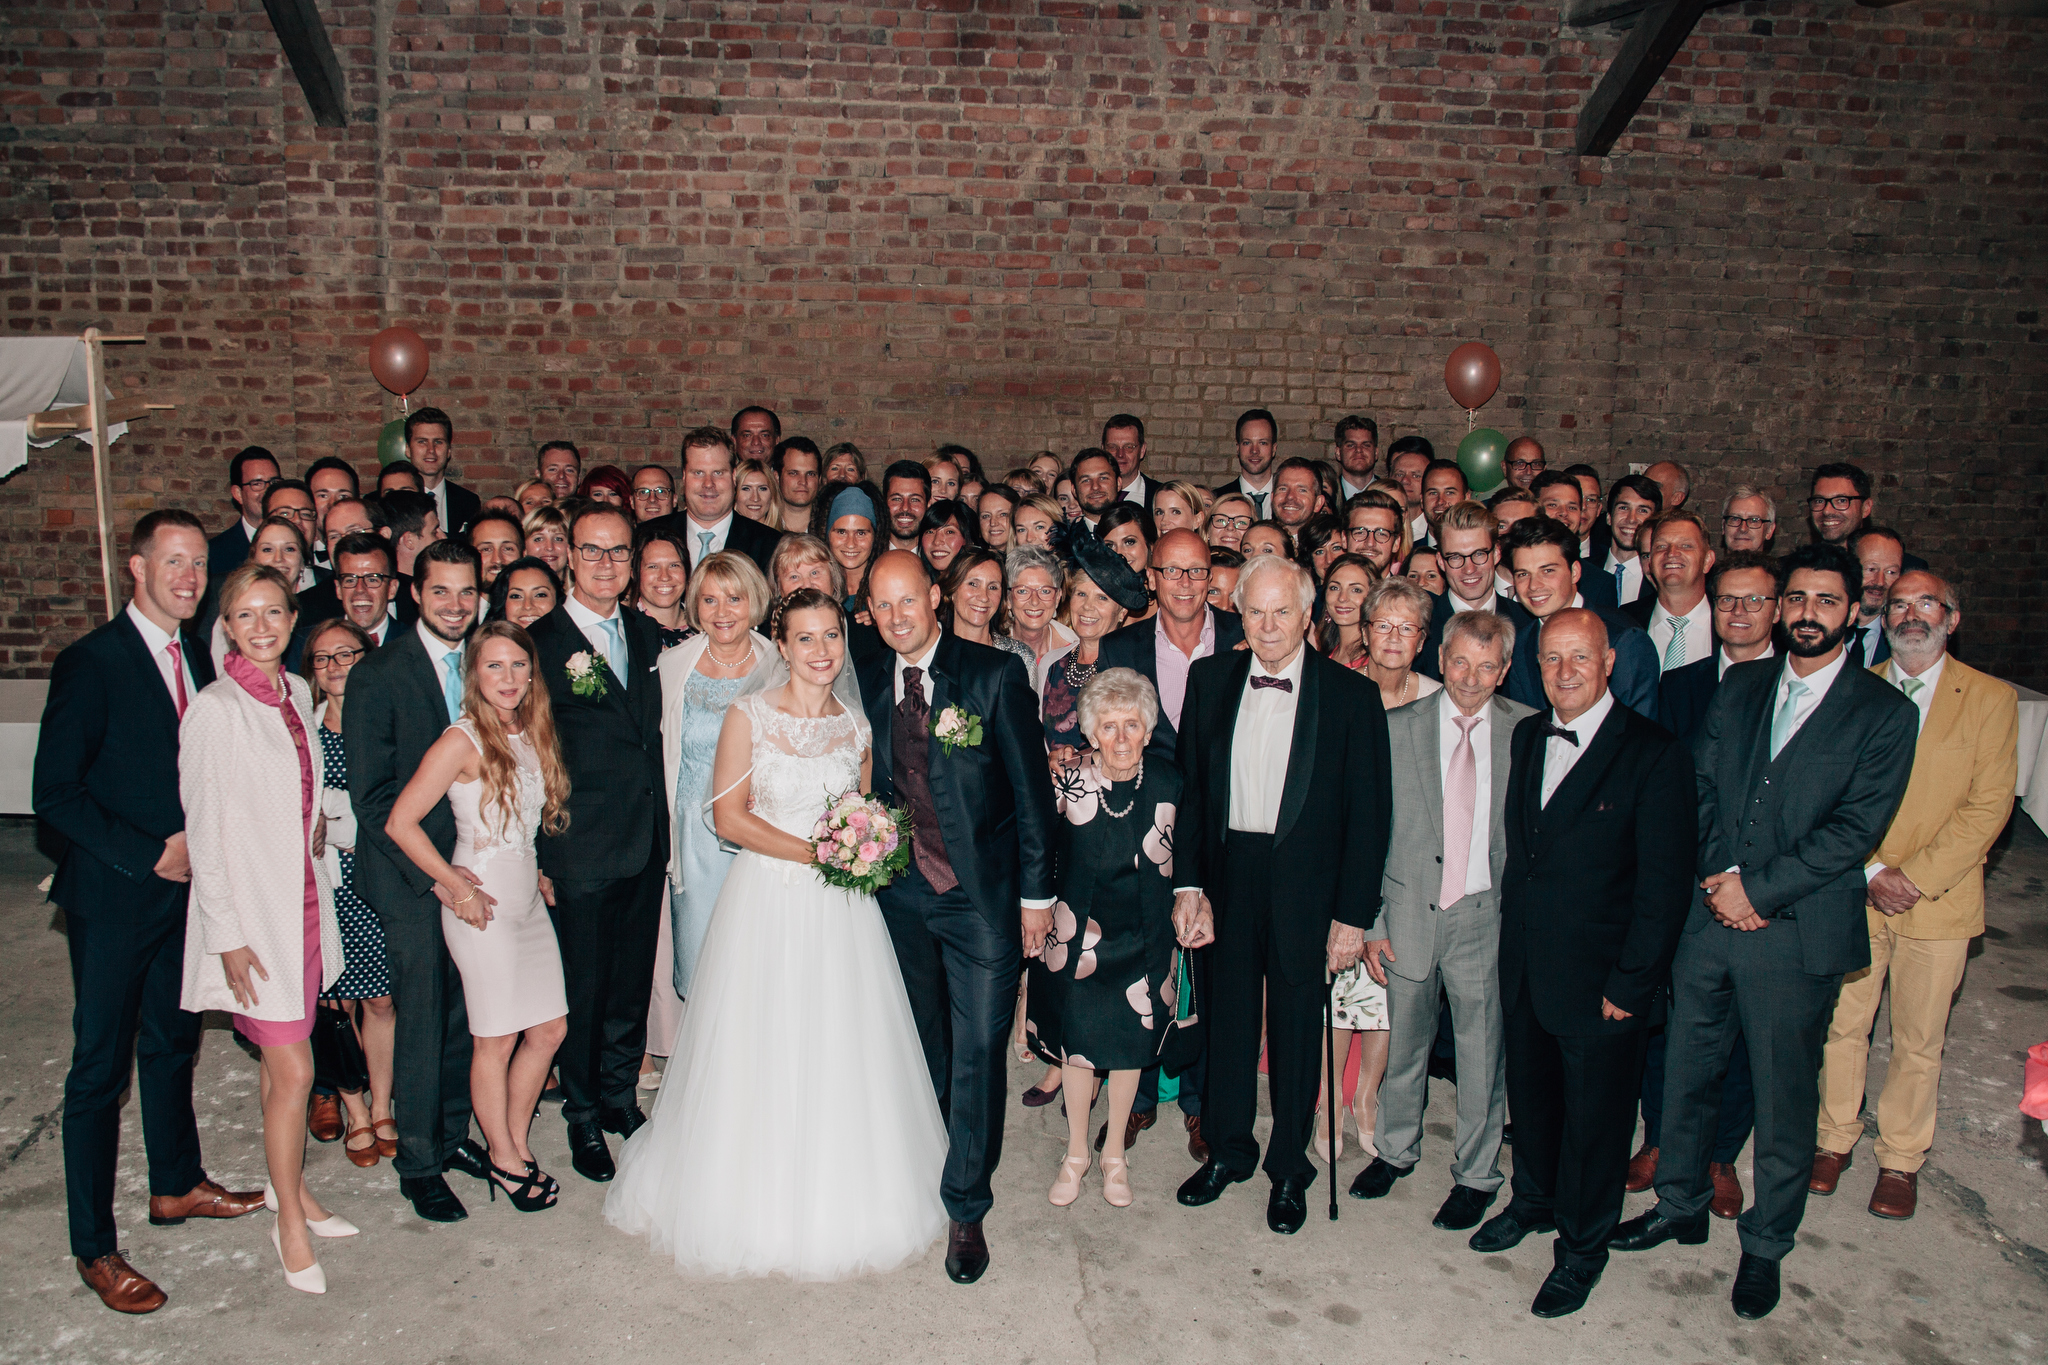 Claudia Krawinkel Fotografie Hochzeitsfotograf Essen Düsseldorf Dormagen Kloster Knechtsteden Hochzeitsreportage Hochzeit Knechtsteden124